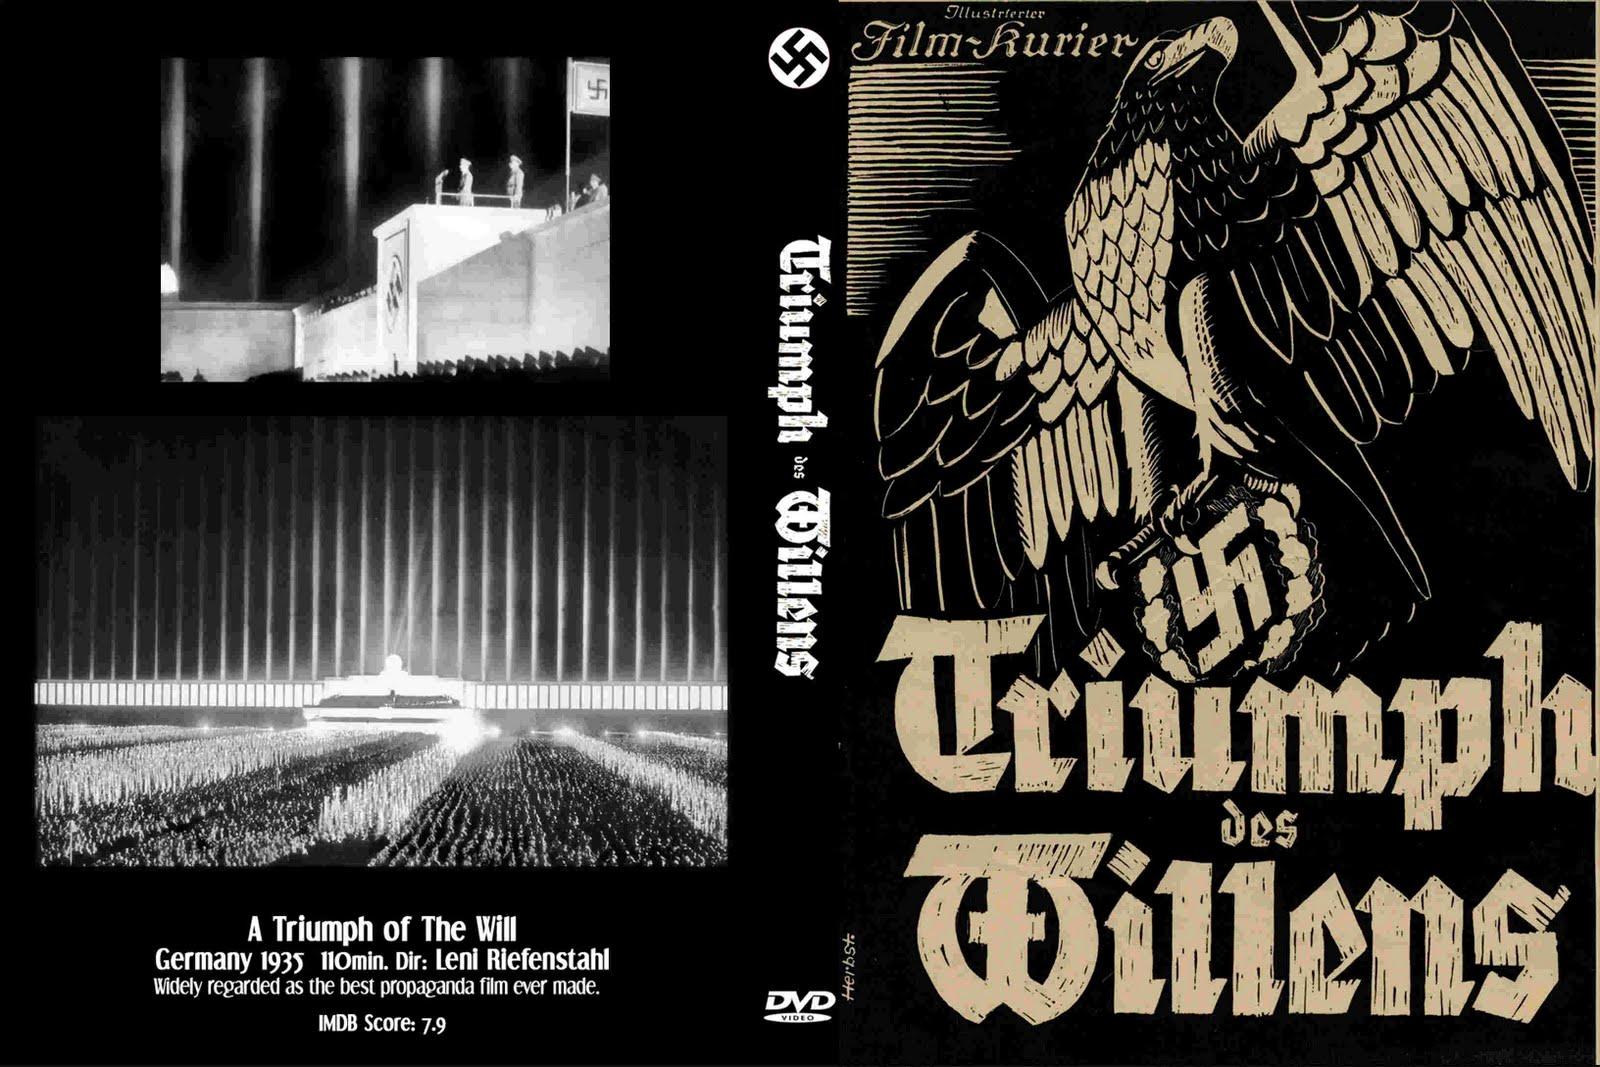 review of nazi propaganda film triumph Triumph of the will (triumph des possibly the most powerful propaganda film ever (1940) is an antisemitic german nazi triumph of the nerds: the rise.